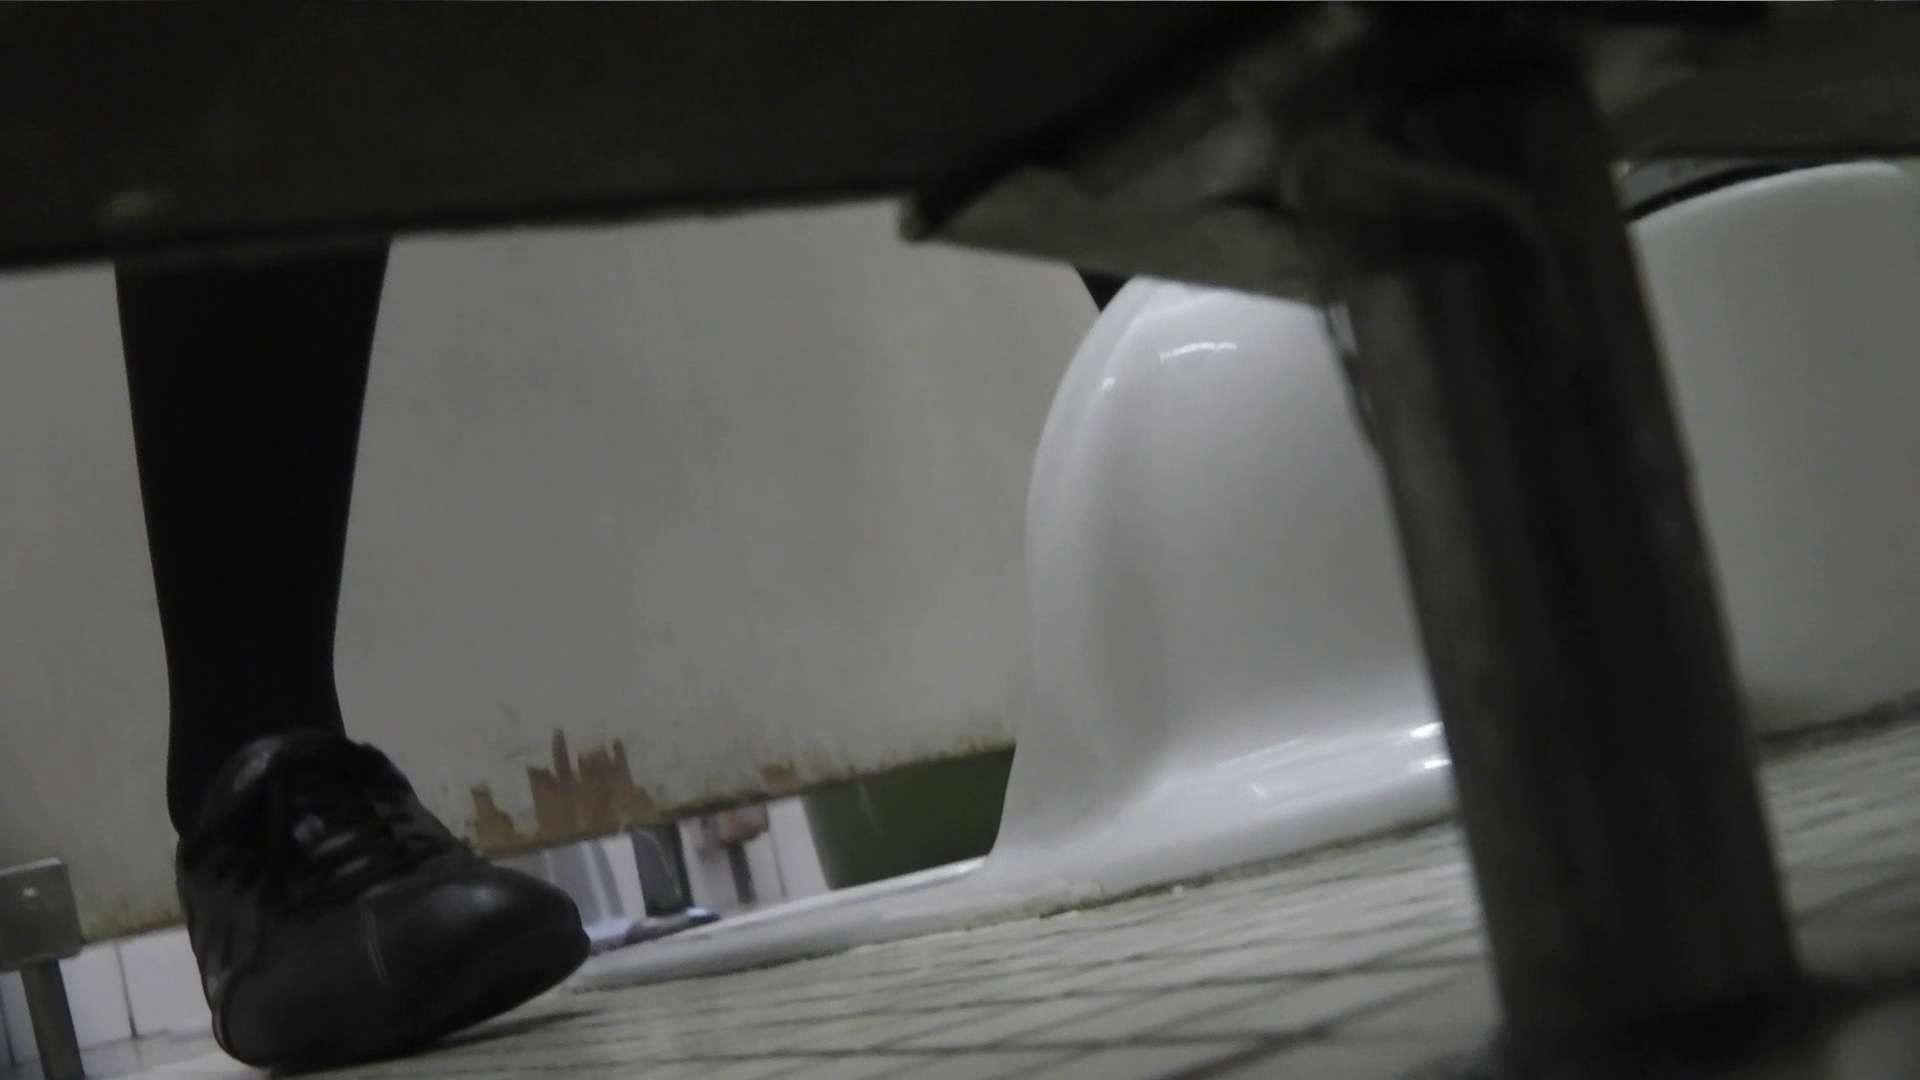 vol.06 命がけ潜伏洗面所! 茶髪タン、ハァハァ 前編 プライベート 覗きワレメ動画紹介 64画像 35